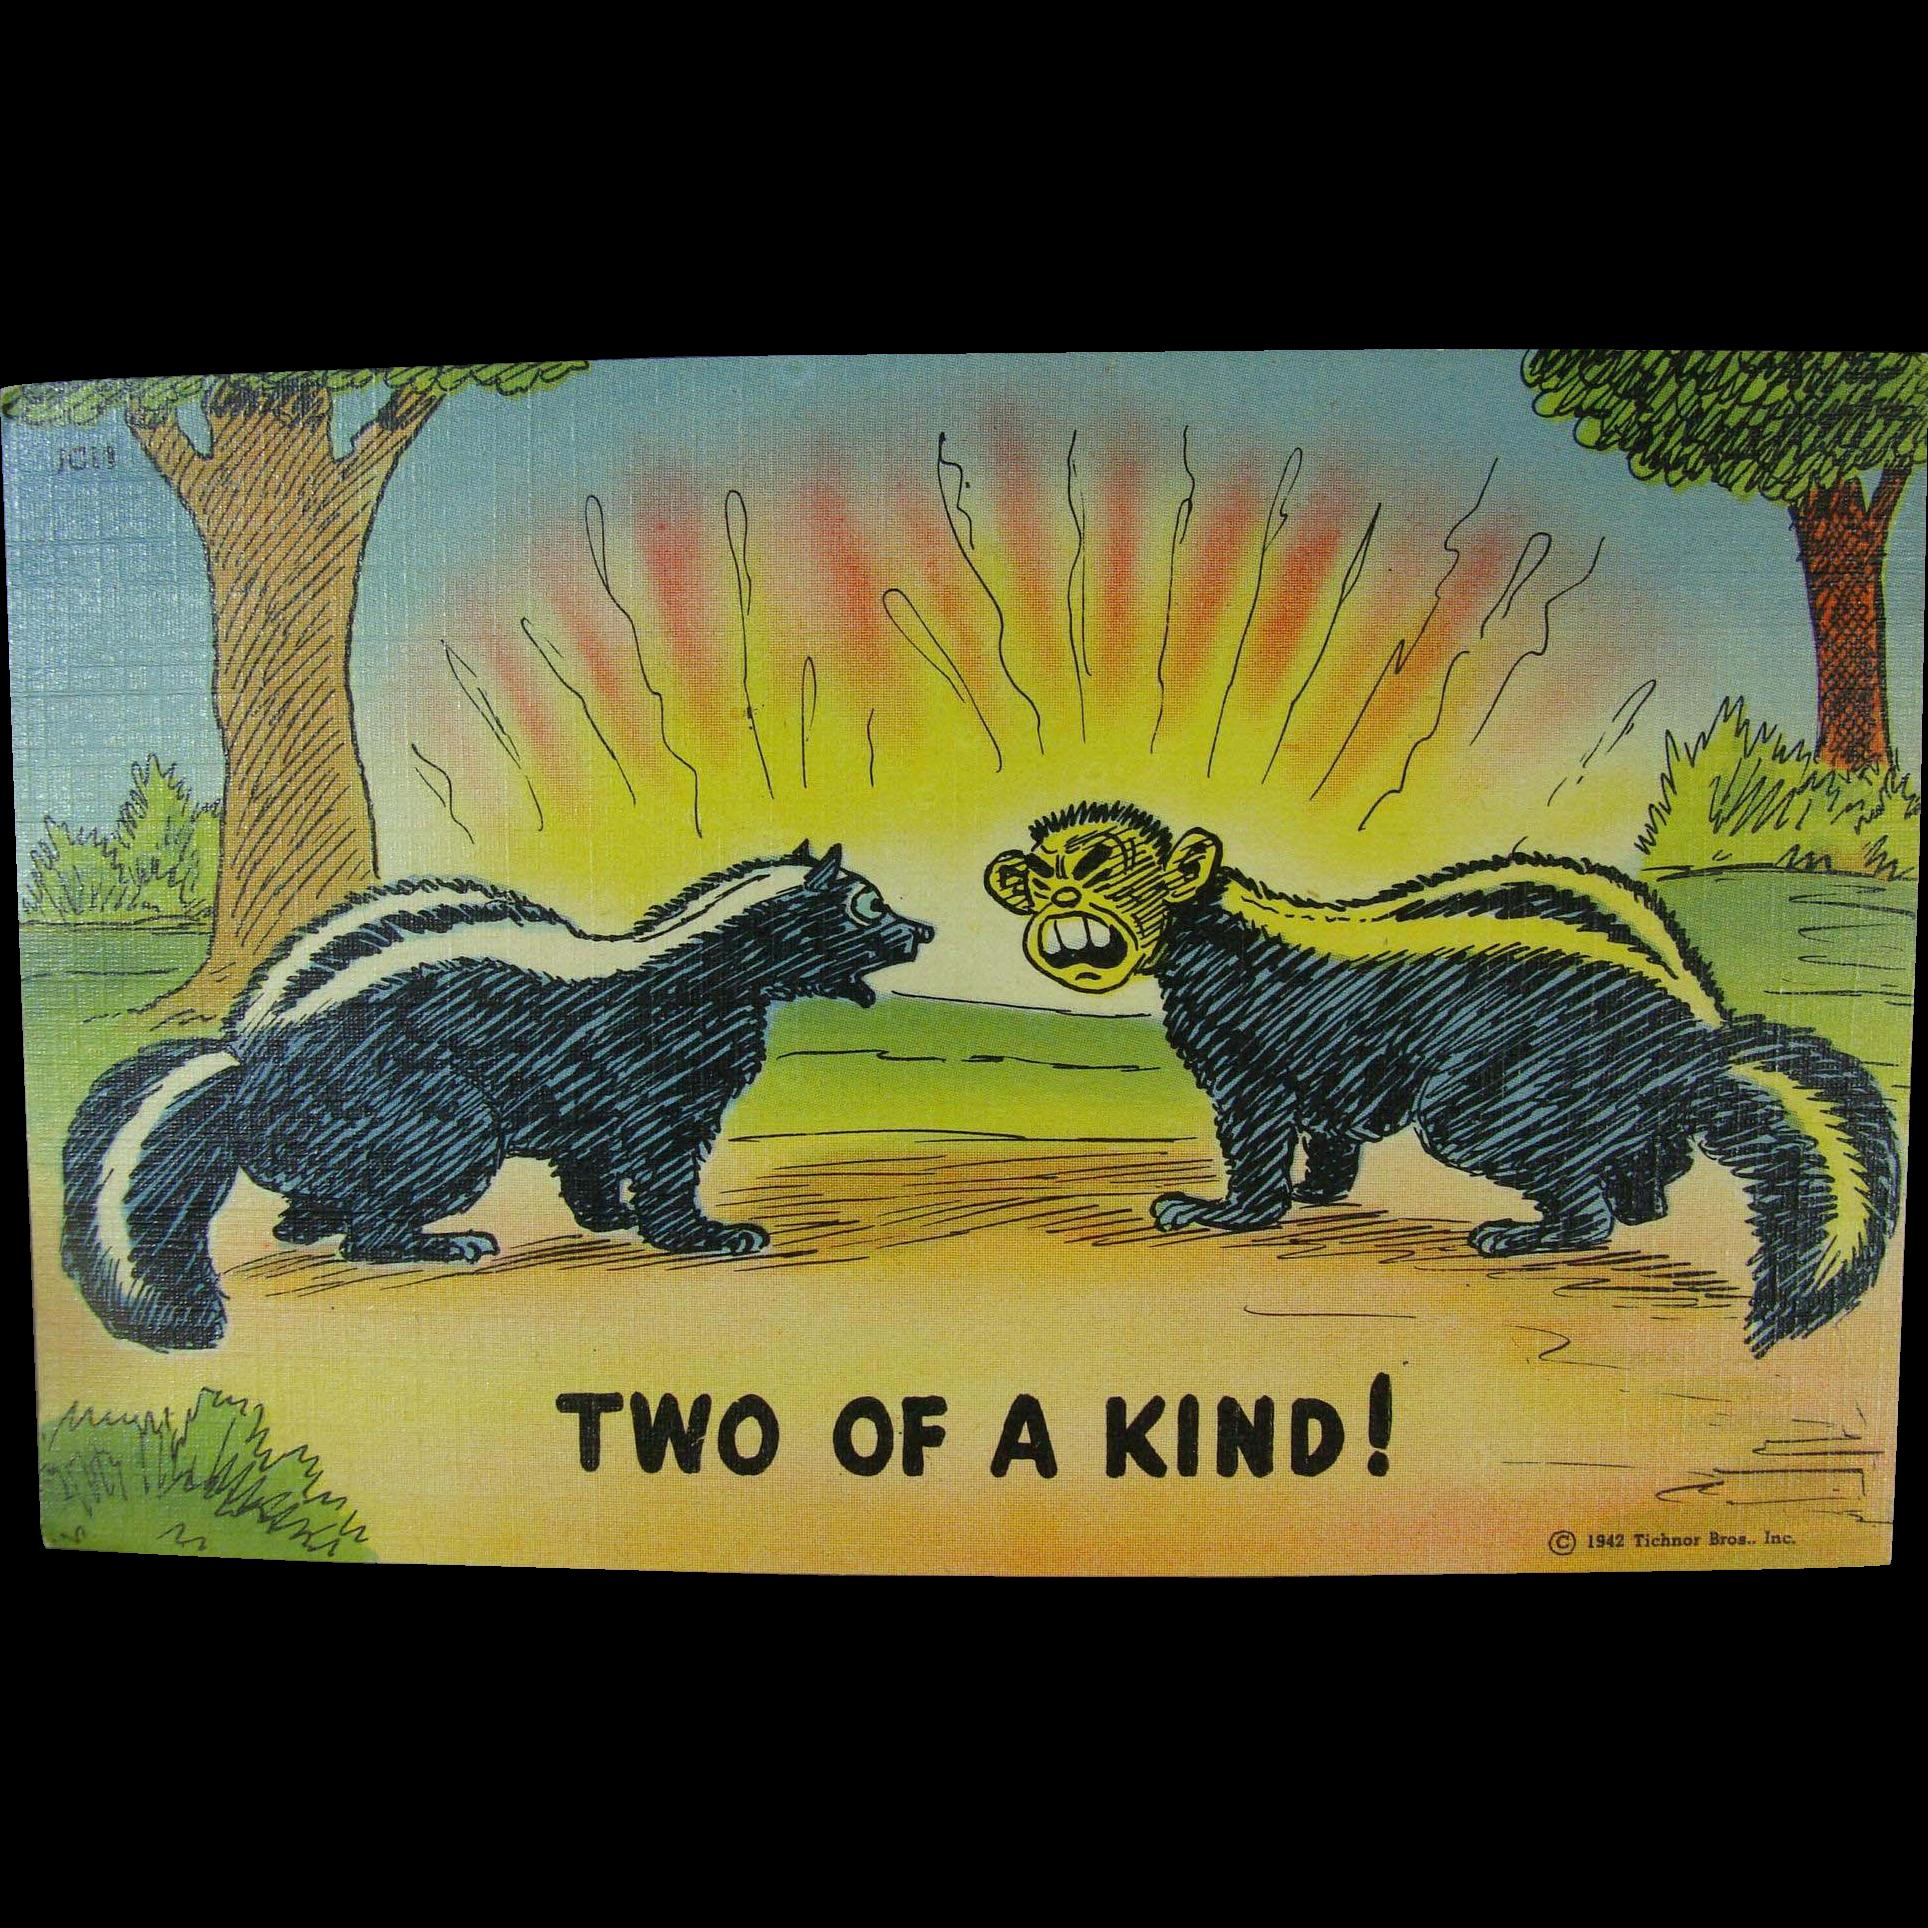 WWII Political Japanese Skunk Joke Post Card